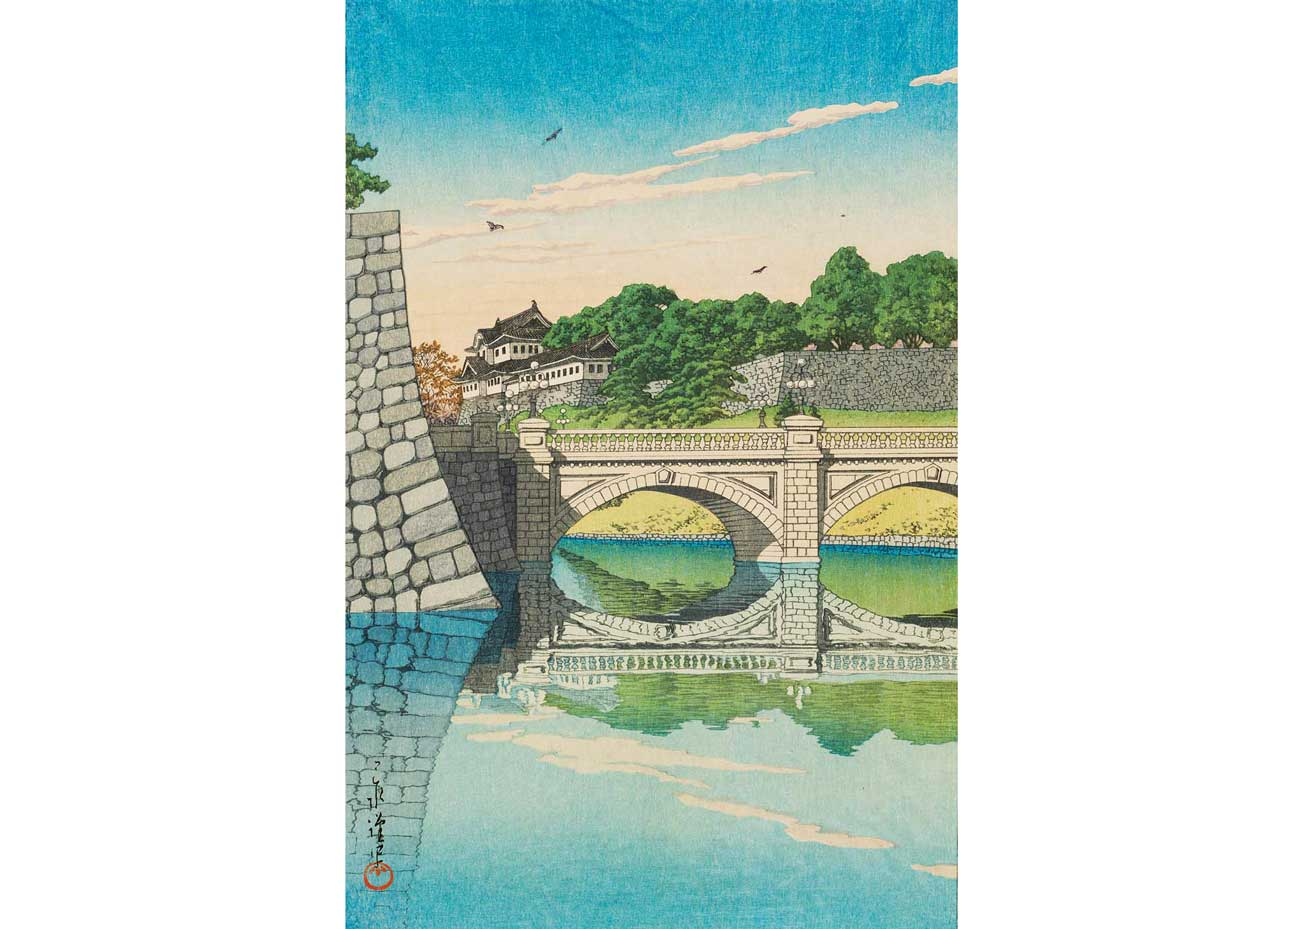 © Kawase Hasui, Nijo Bridge, 1930 Woodblock Print, from the  Museum of Fine Arts, Boston .